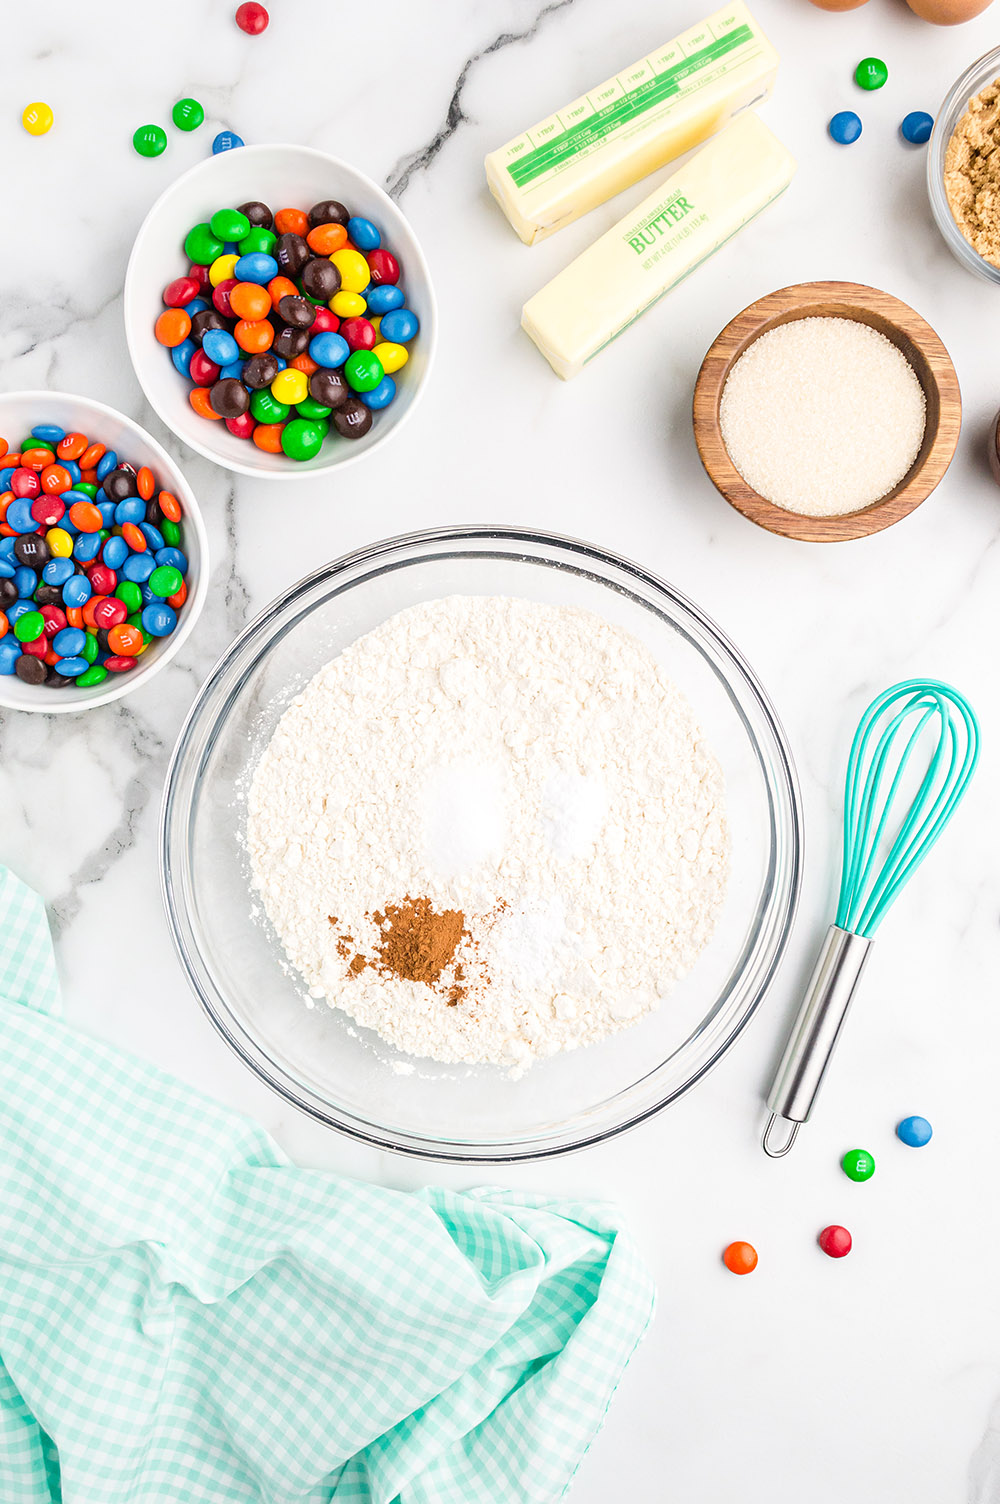 Bowls of ingredients to make M&M cookies.